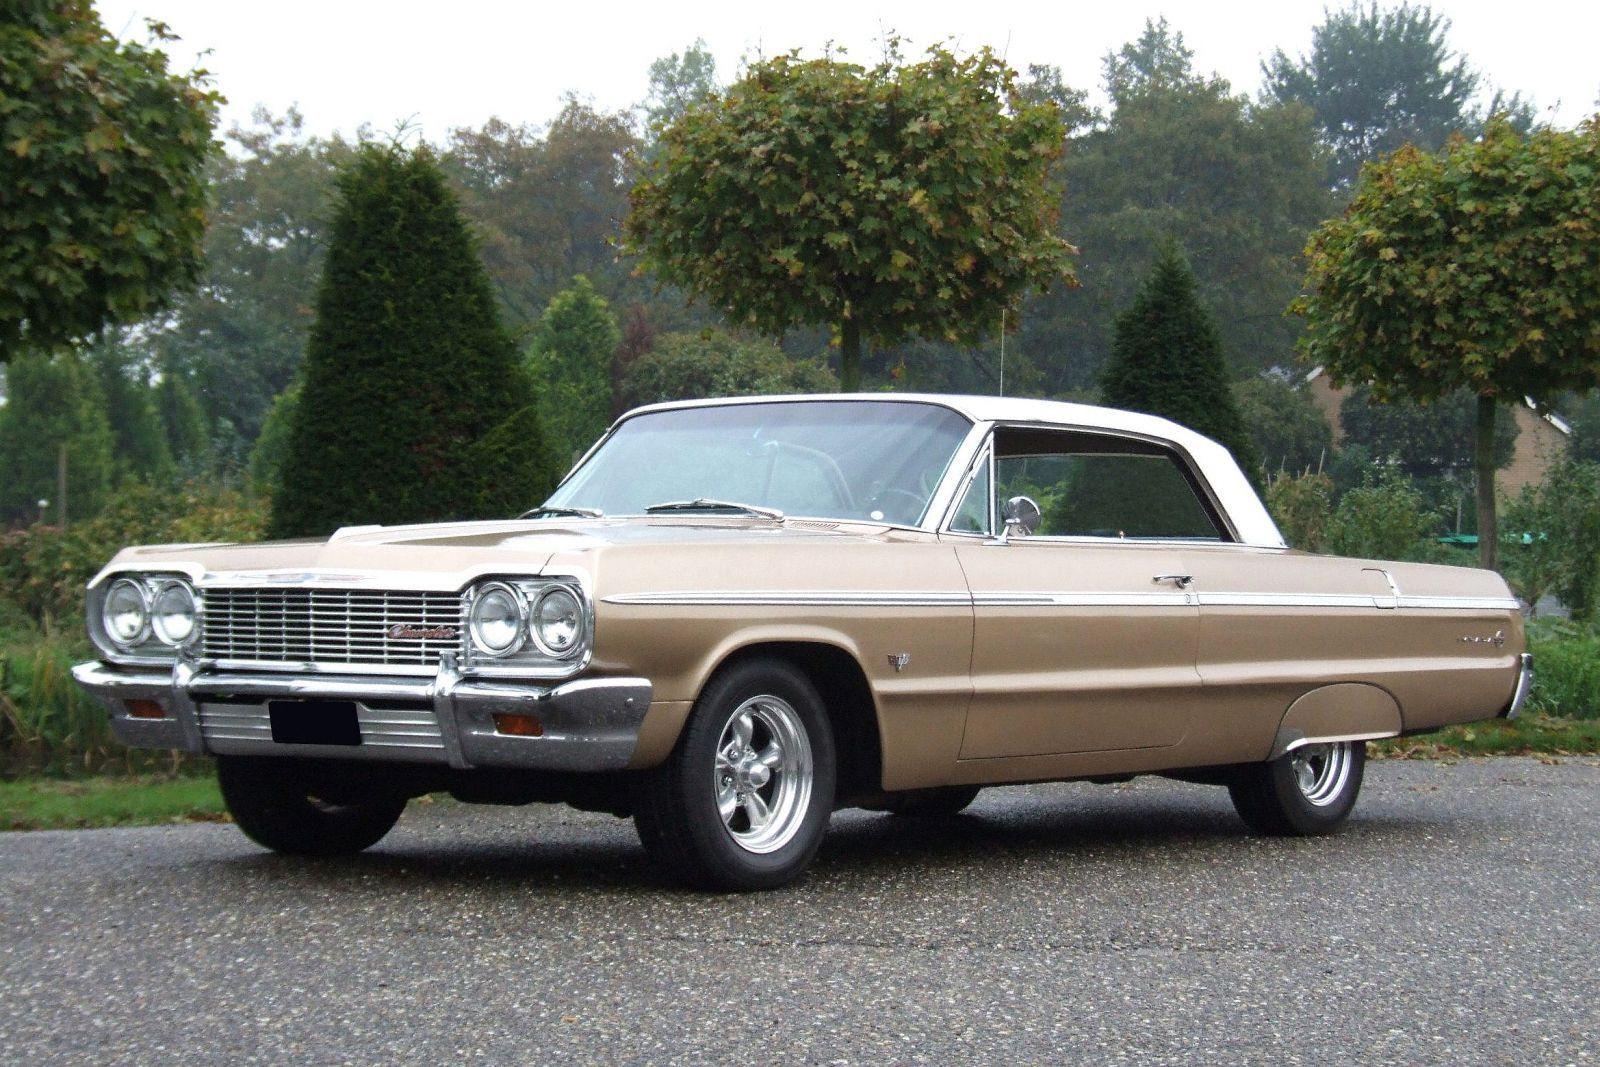 impala car 1964 chevrolet impala chevy classic impala vintage rh pinterest com